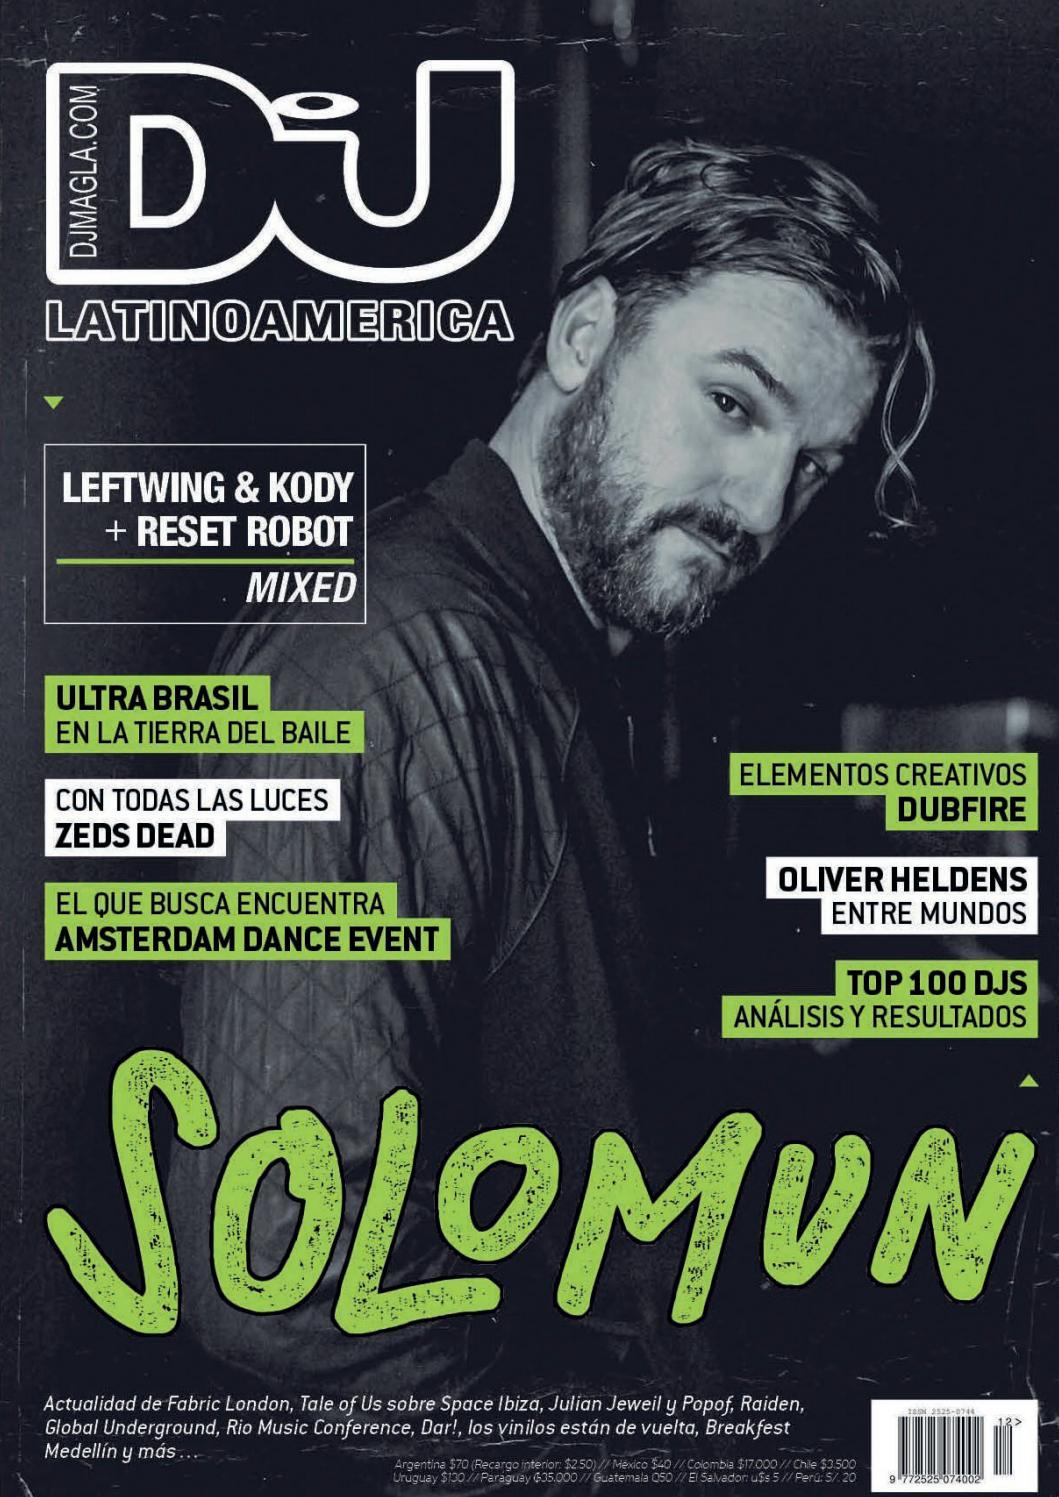 Dj Mag La 012 By Dj Mag Latinoamérica Issuu